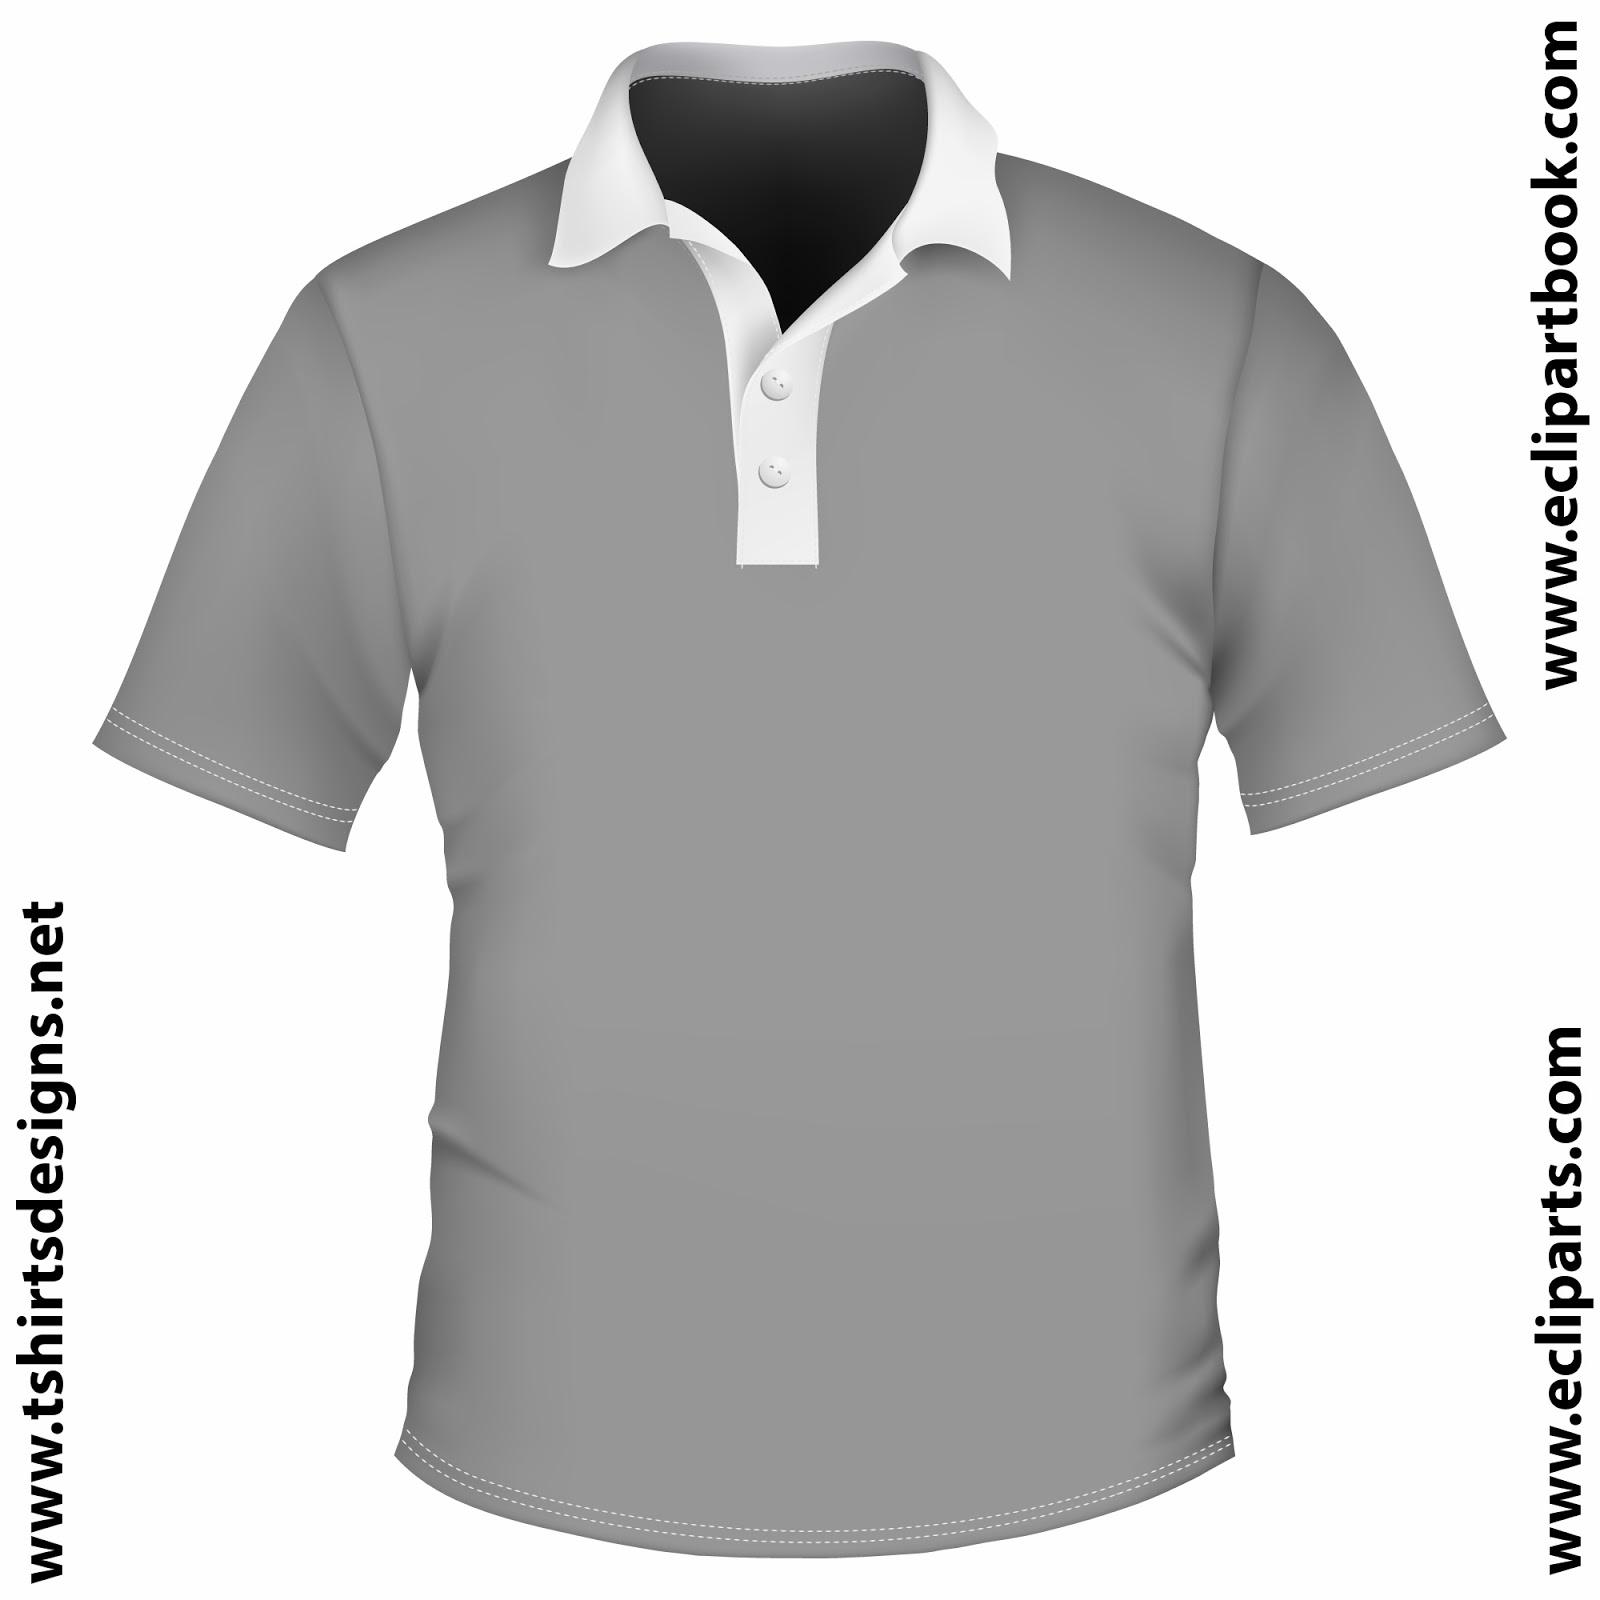 t shirt designs with collar joy studio design gallery